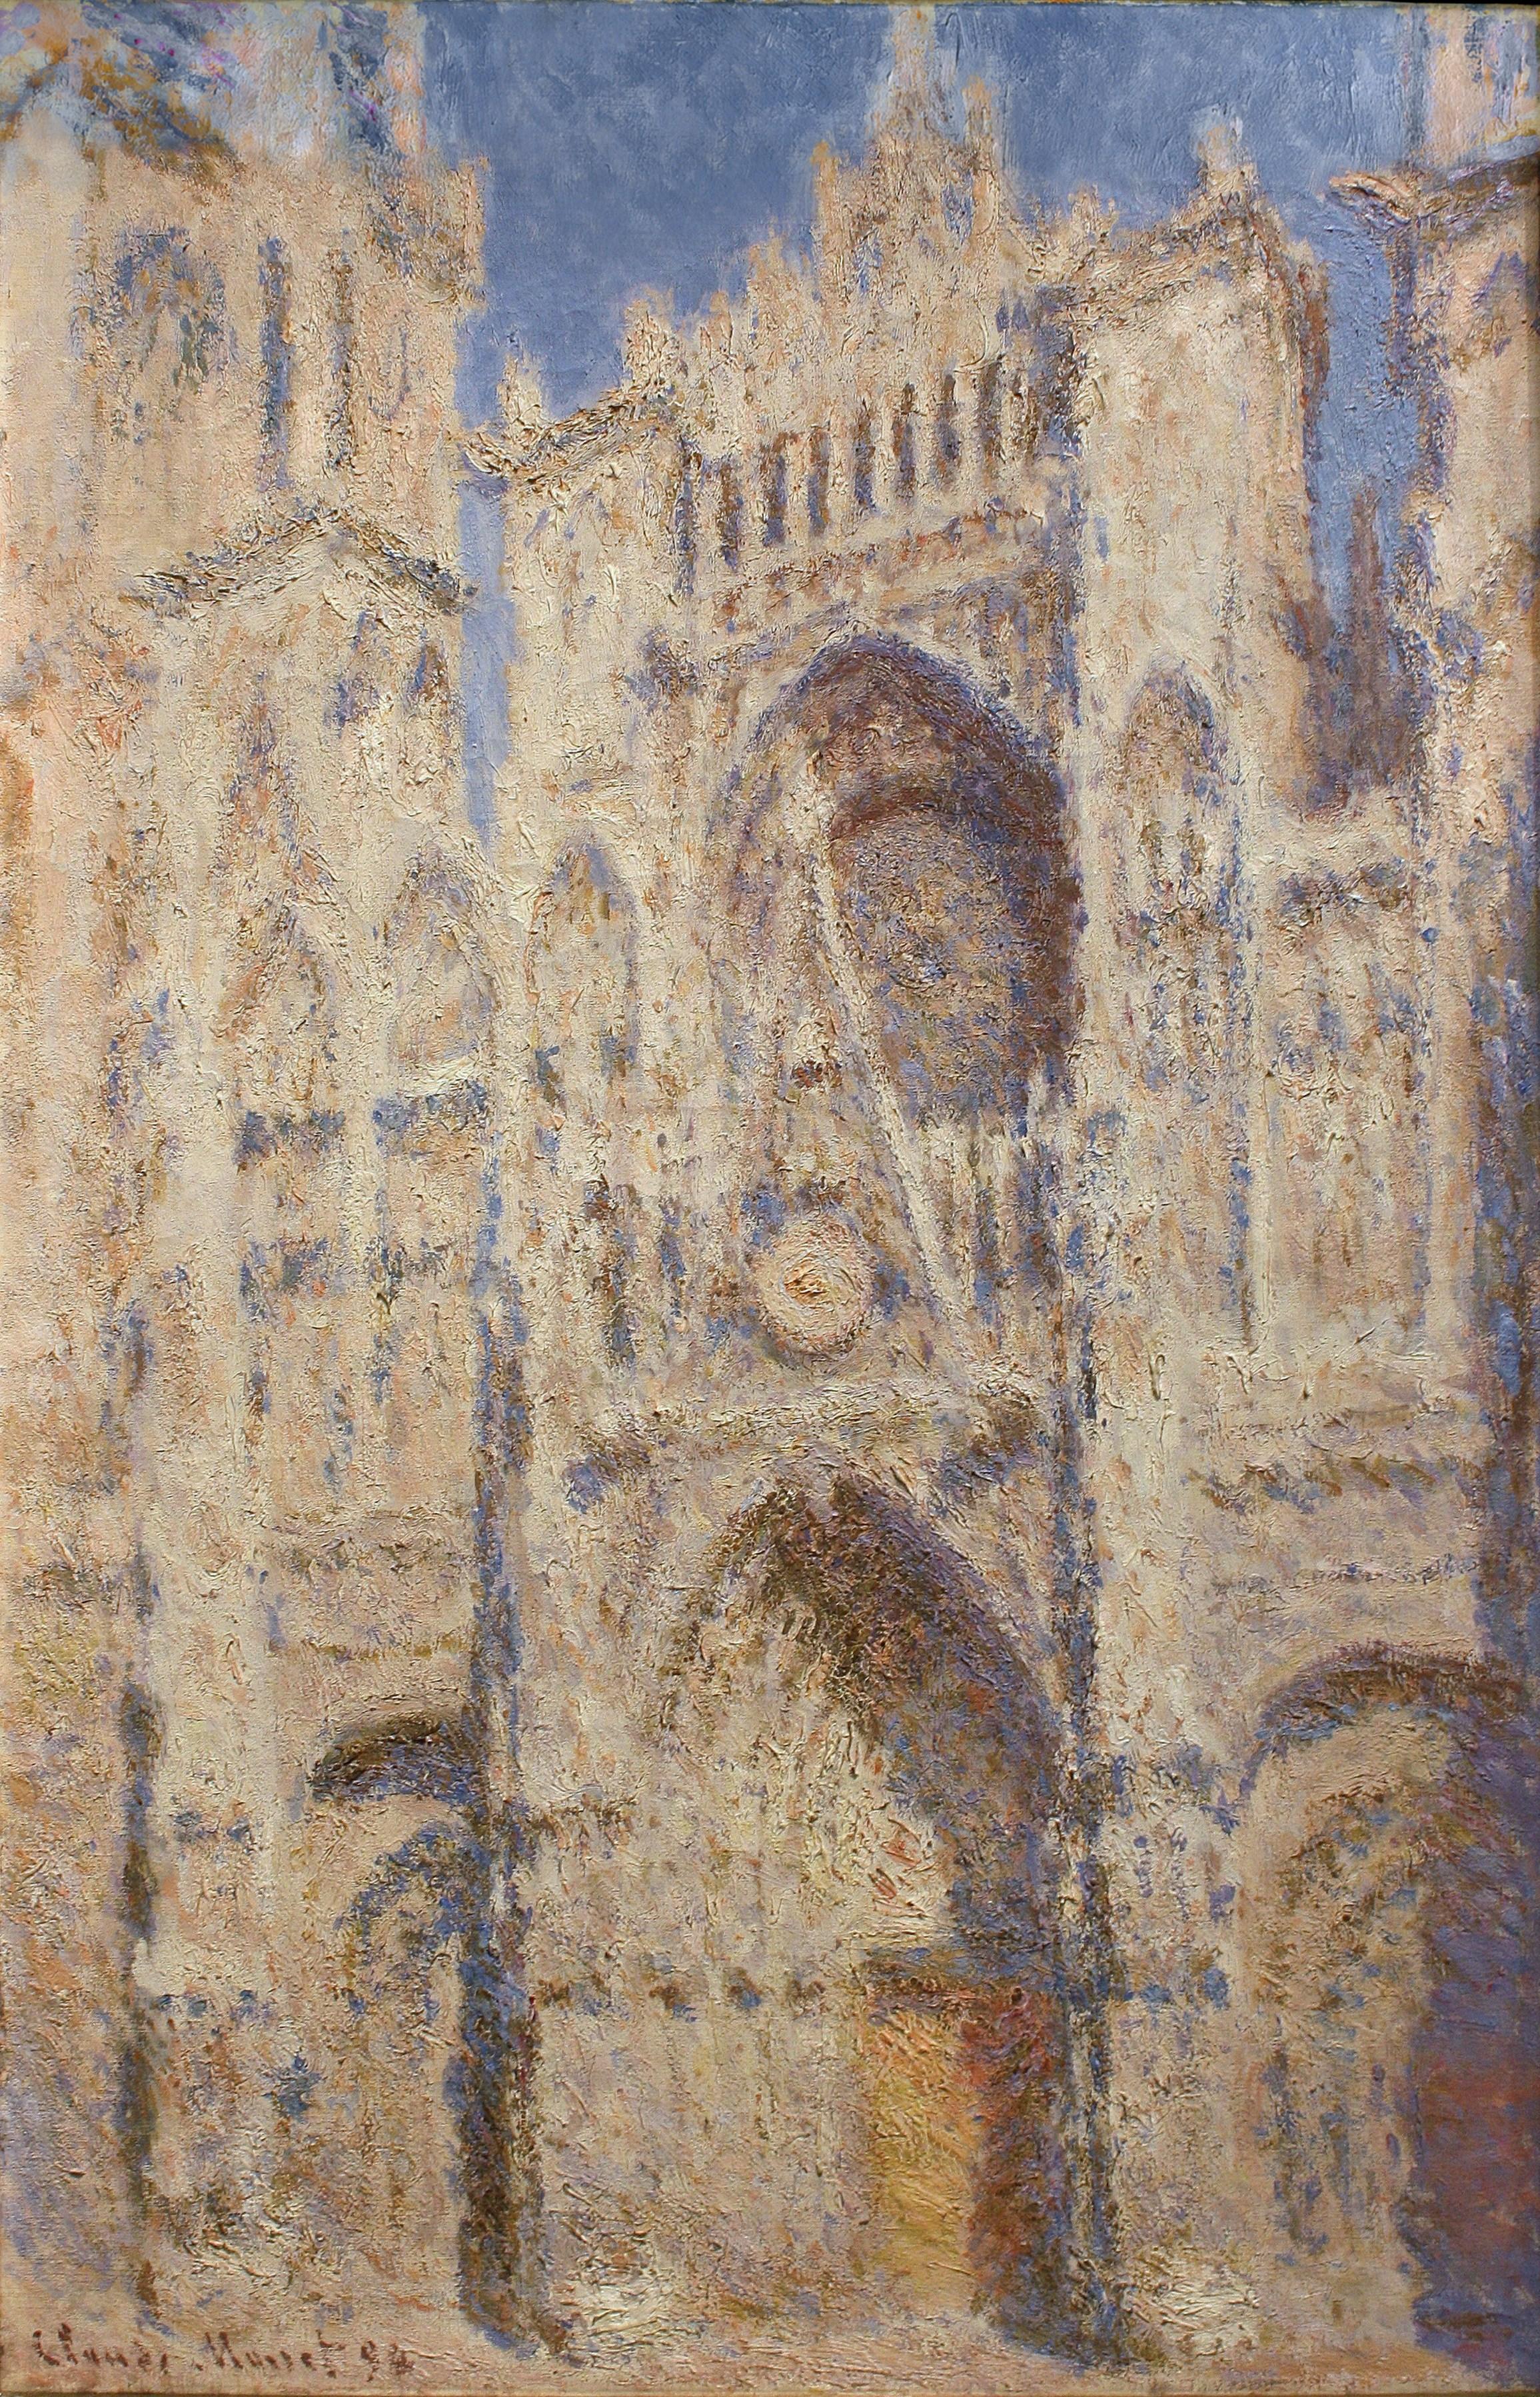 Fichier:Claude Monet - Rouen Cathedral - The Portal (Sunlight).jpg —  Wikipédia